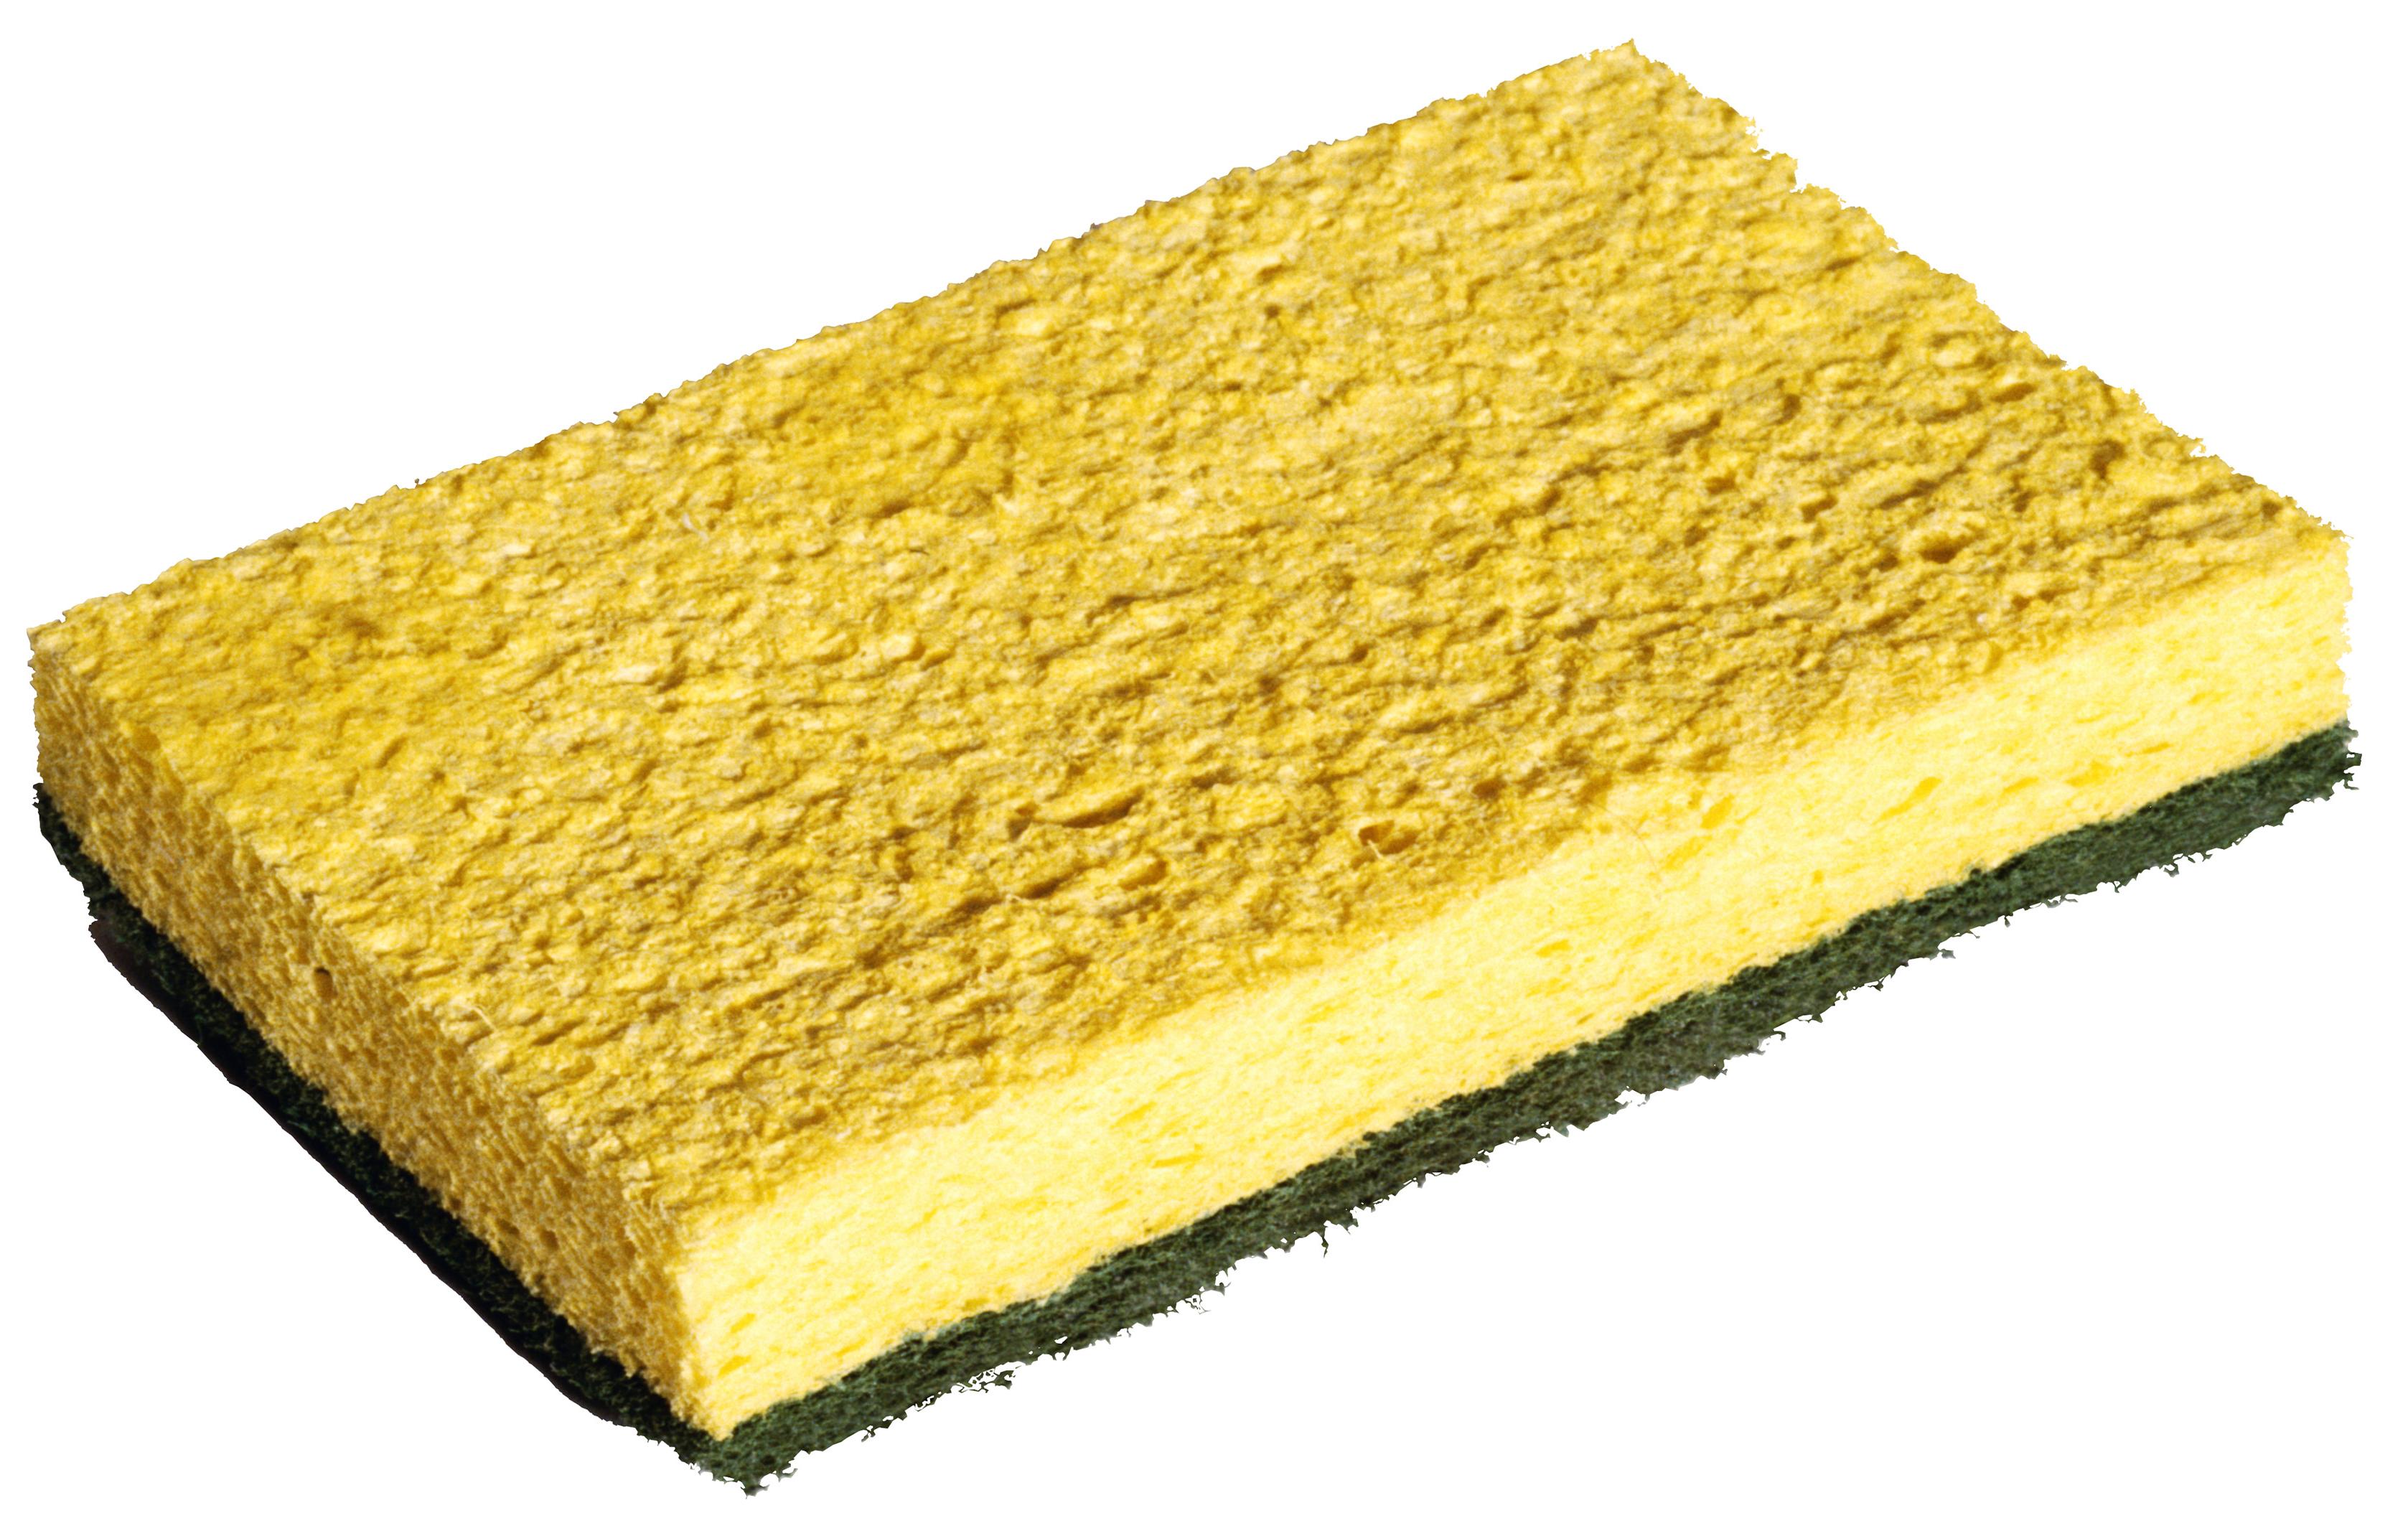 sponge_PNG16